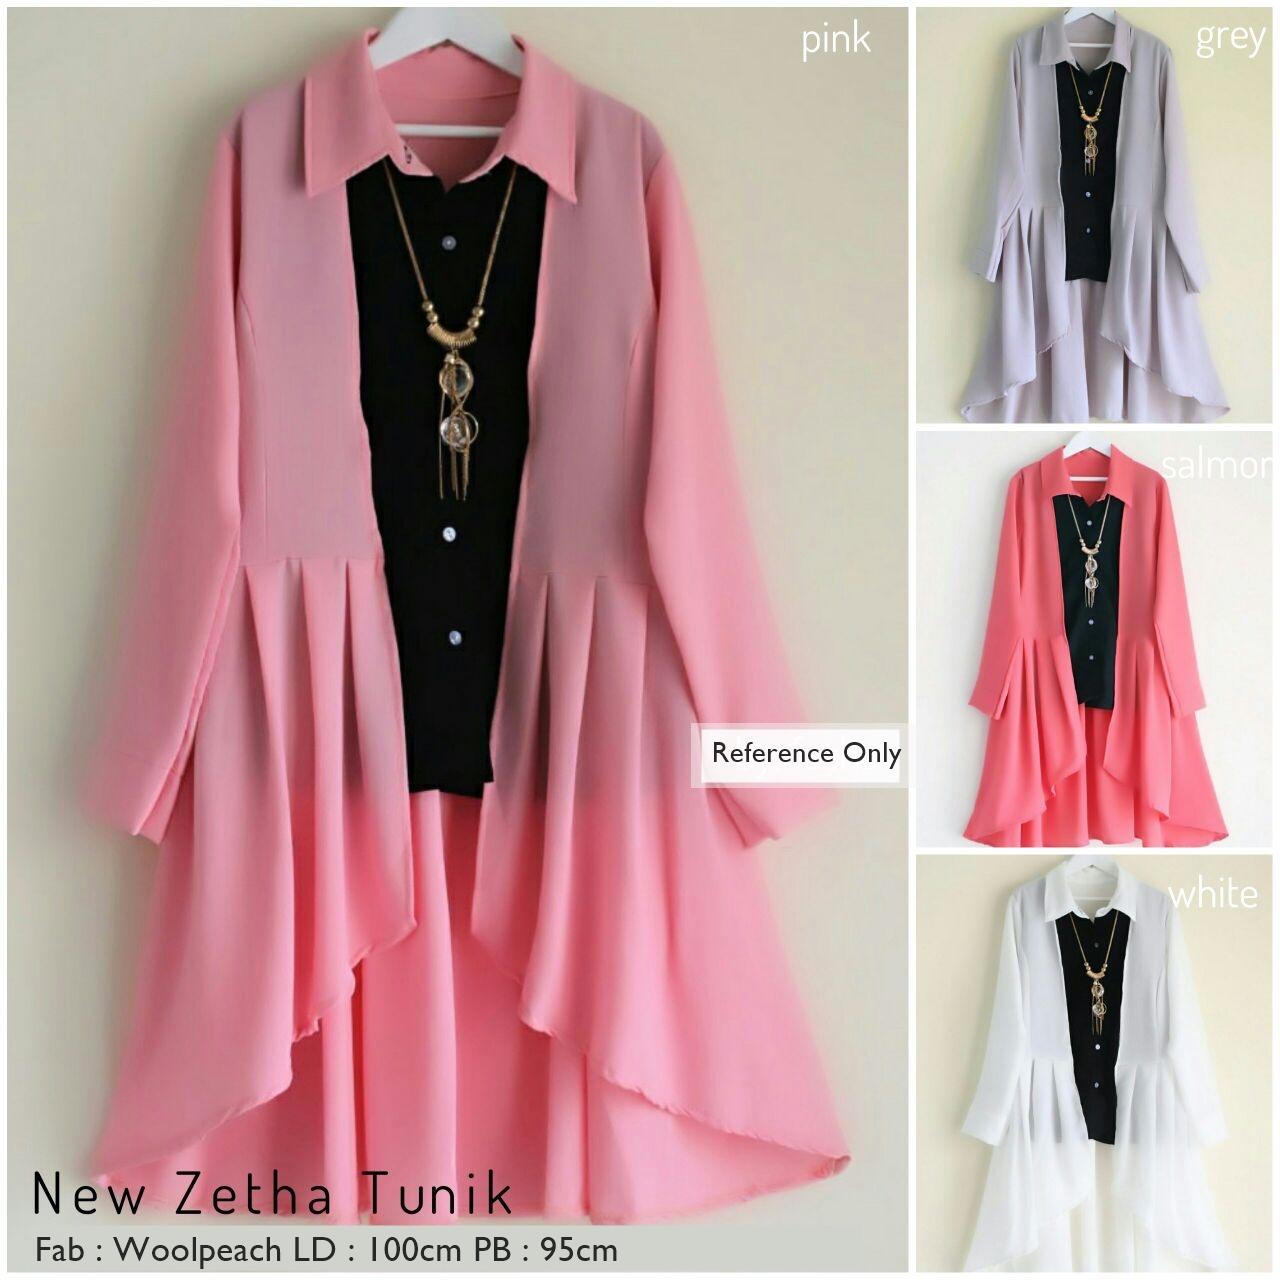 Baju Tunik Wanita Terbaru Baju Tunik Muslim Wanita Baju Atasan ... 521fb4826d